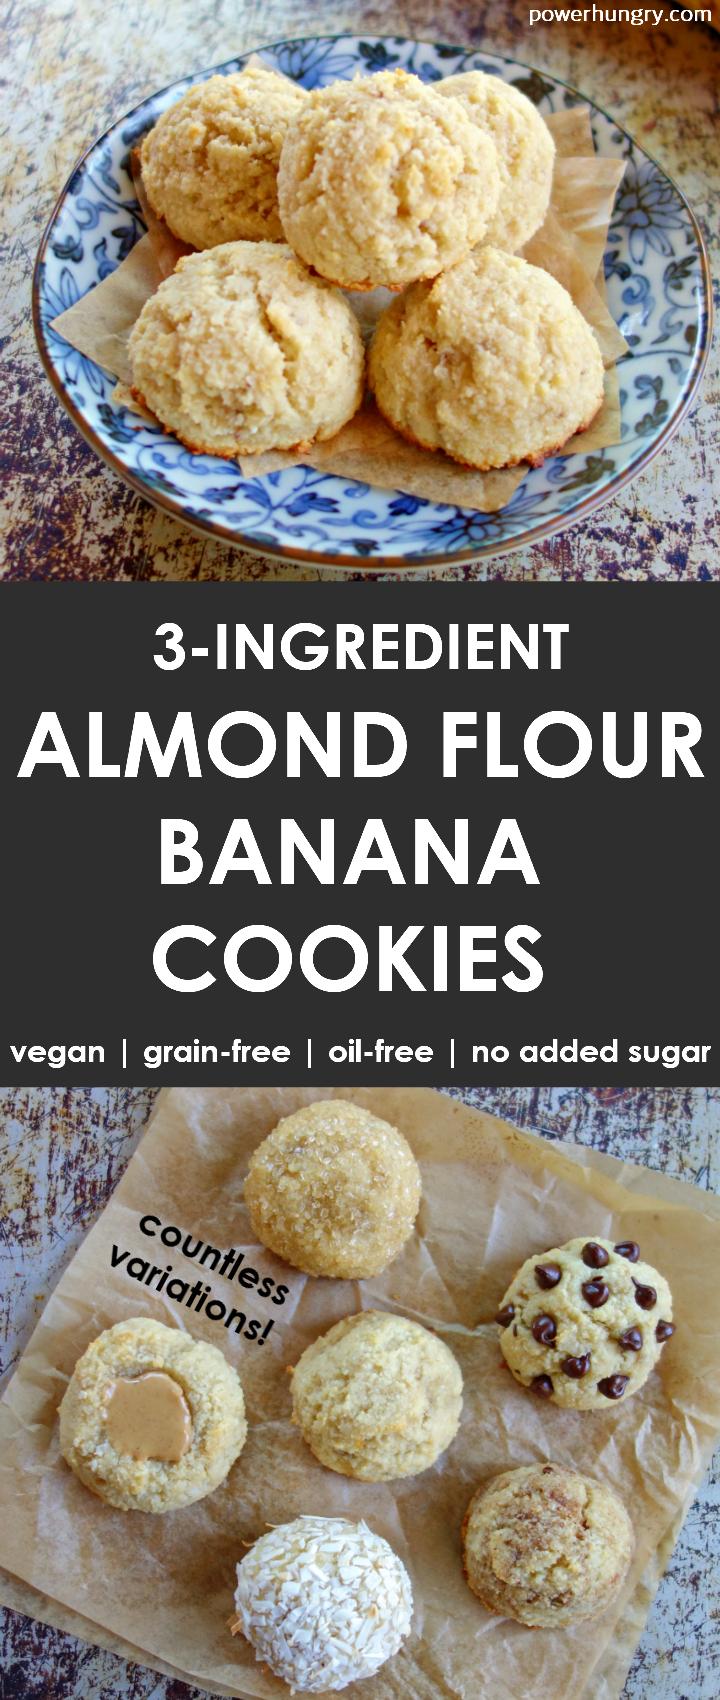 3 Ingredient Almond Flour Banana Cookies Vegan Grain Free